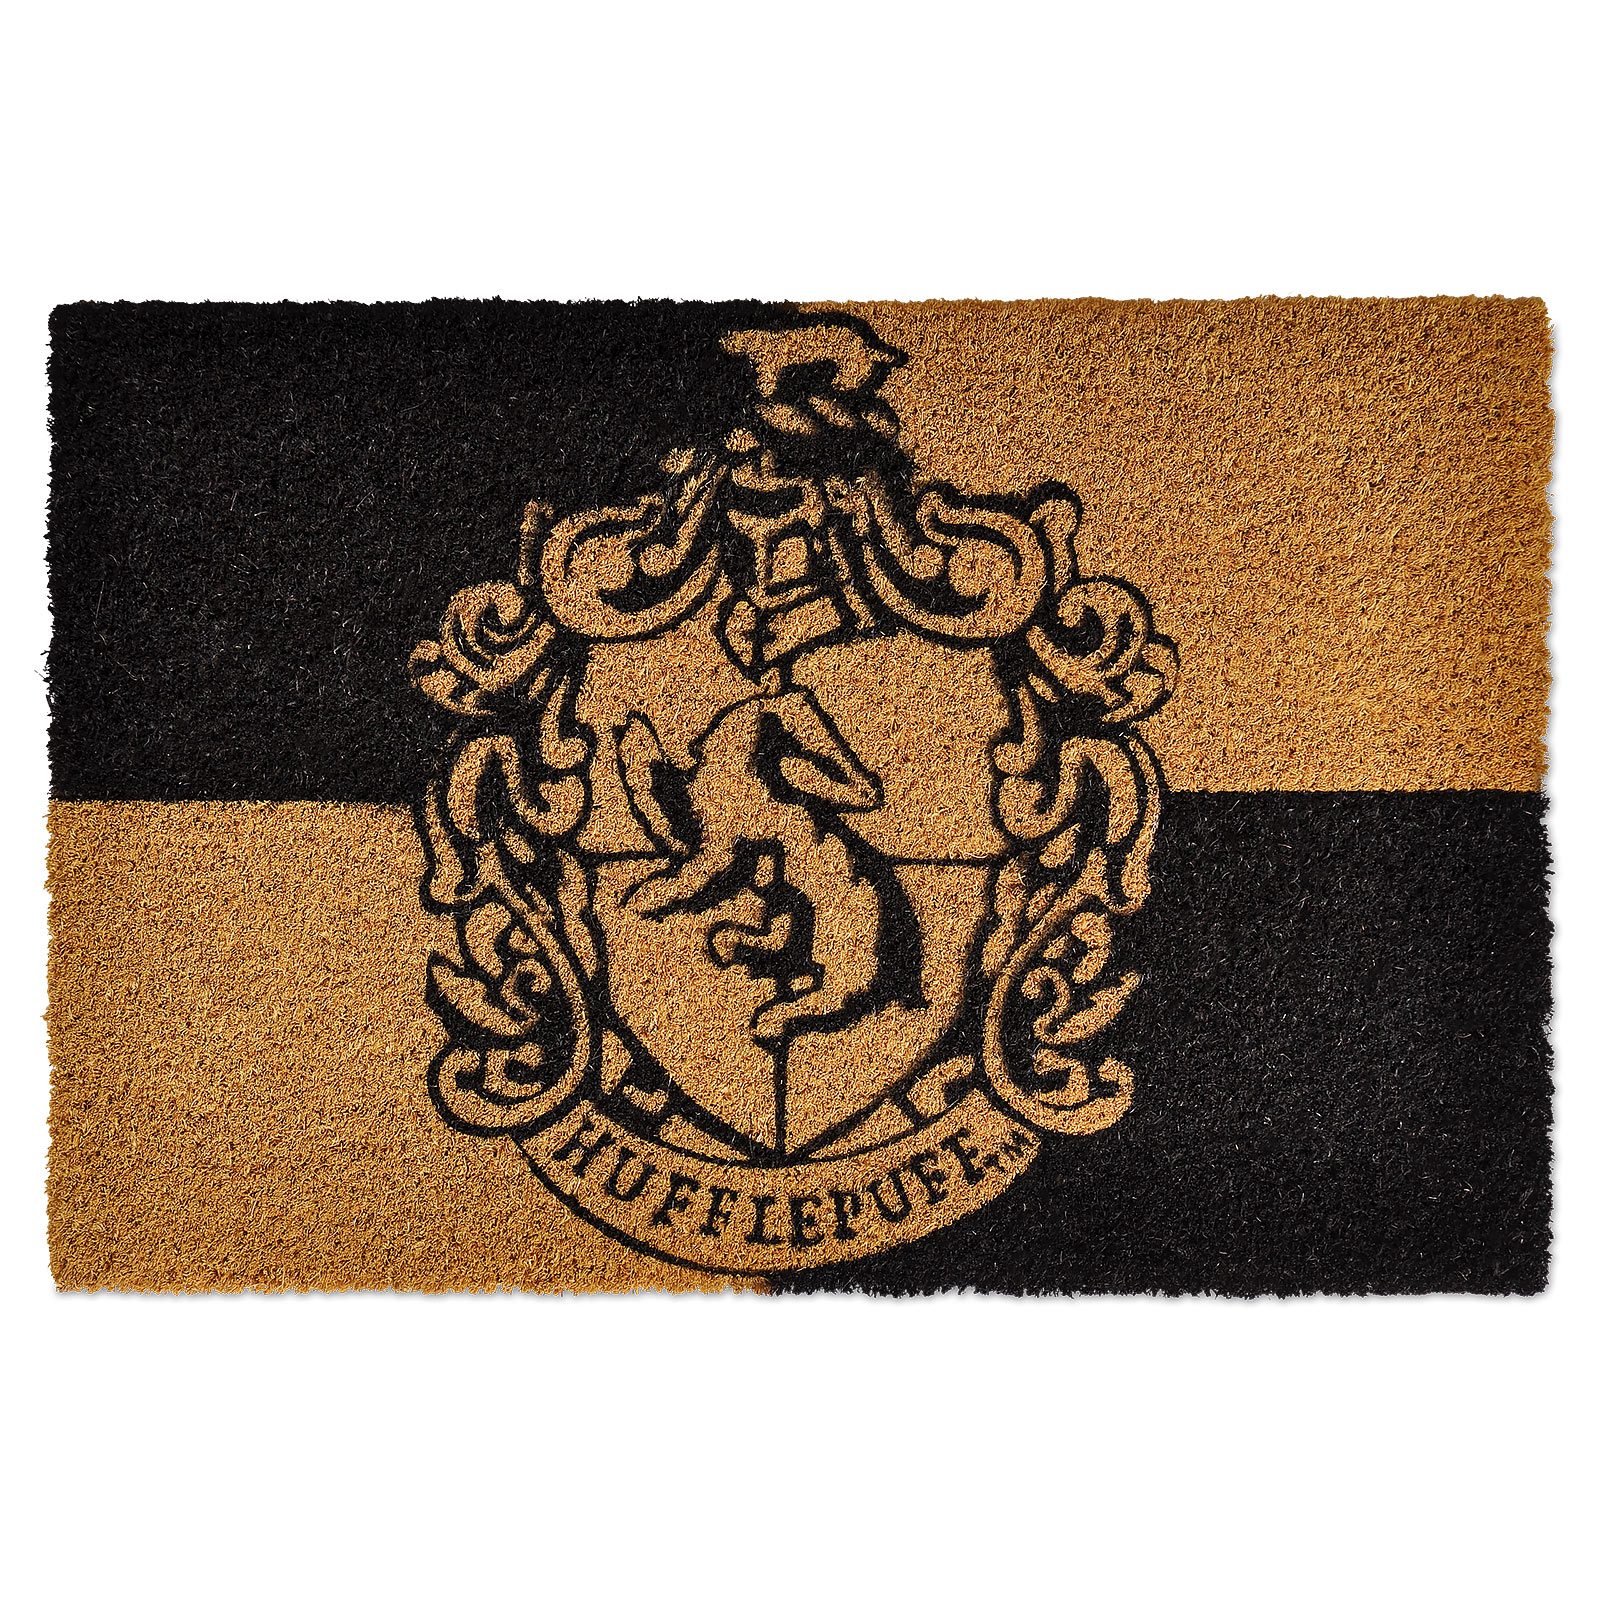 Harry Potter - Hufflepuff Fußmatte